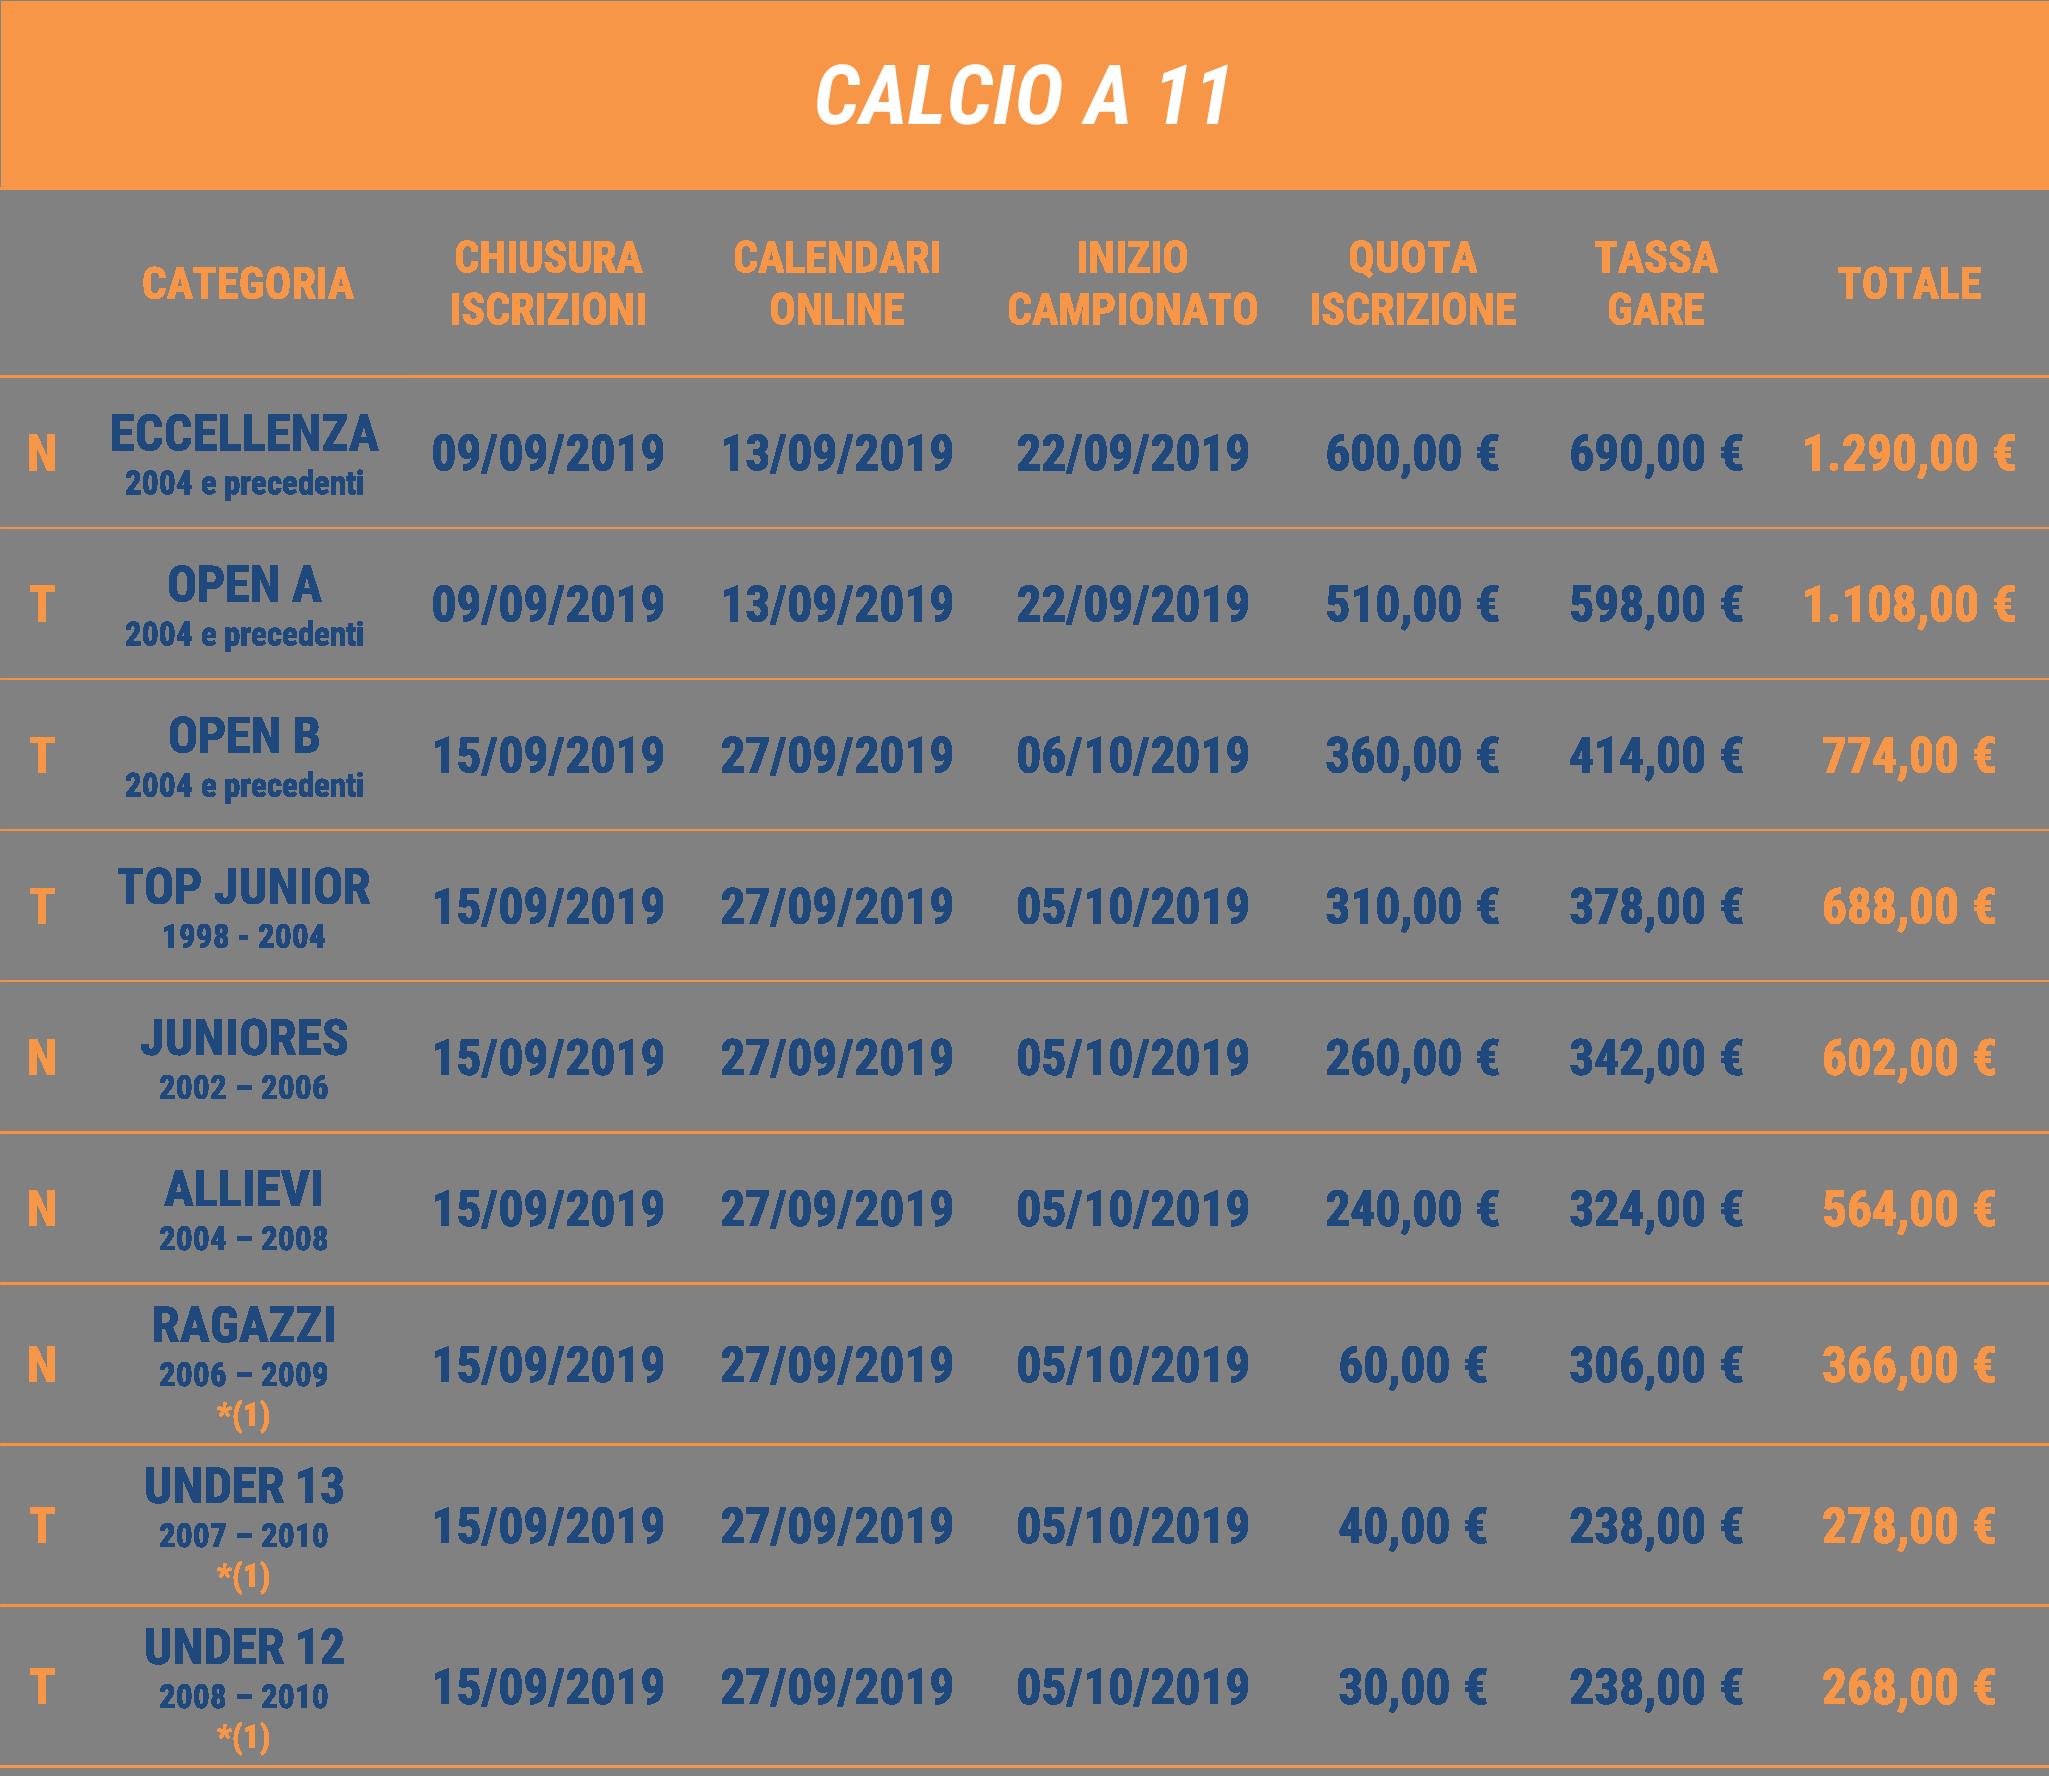 Calendario Csi Milano.Campionato Provinciale Calcio A 11 Calcio A 11 Calcio